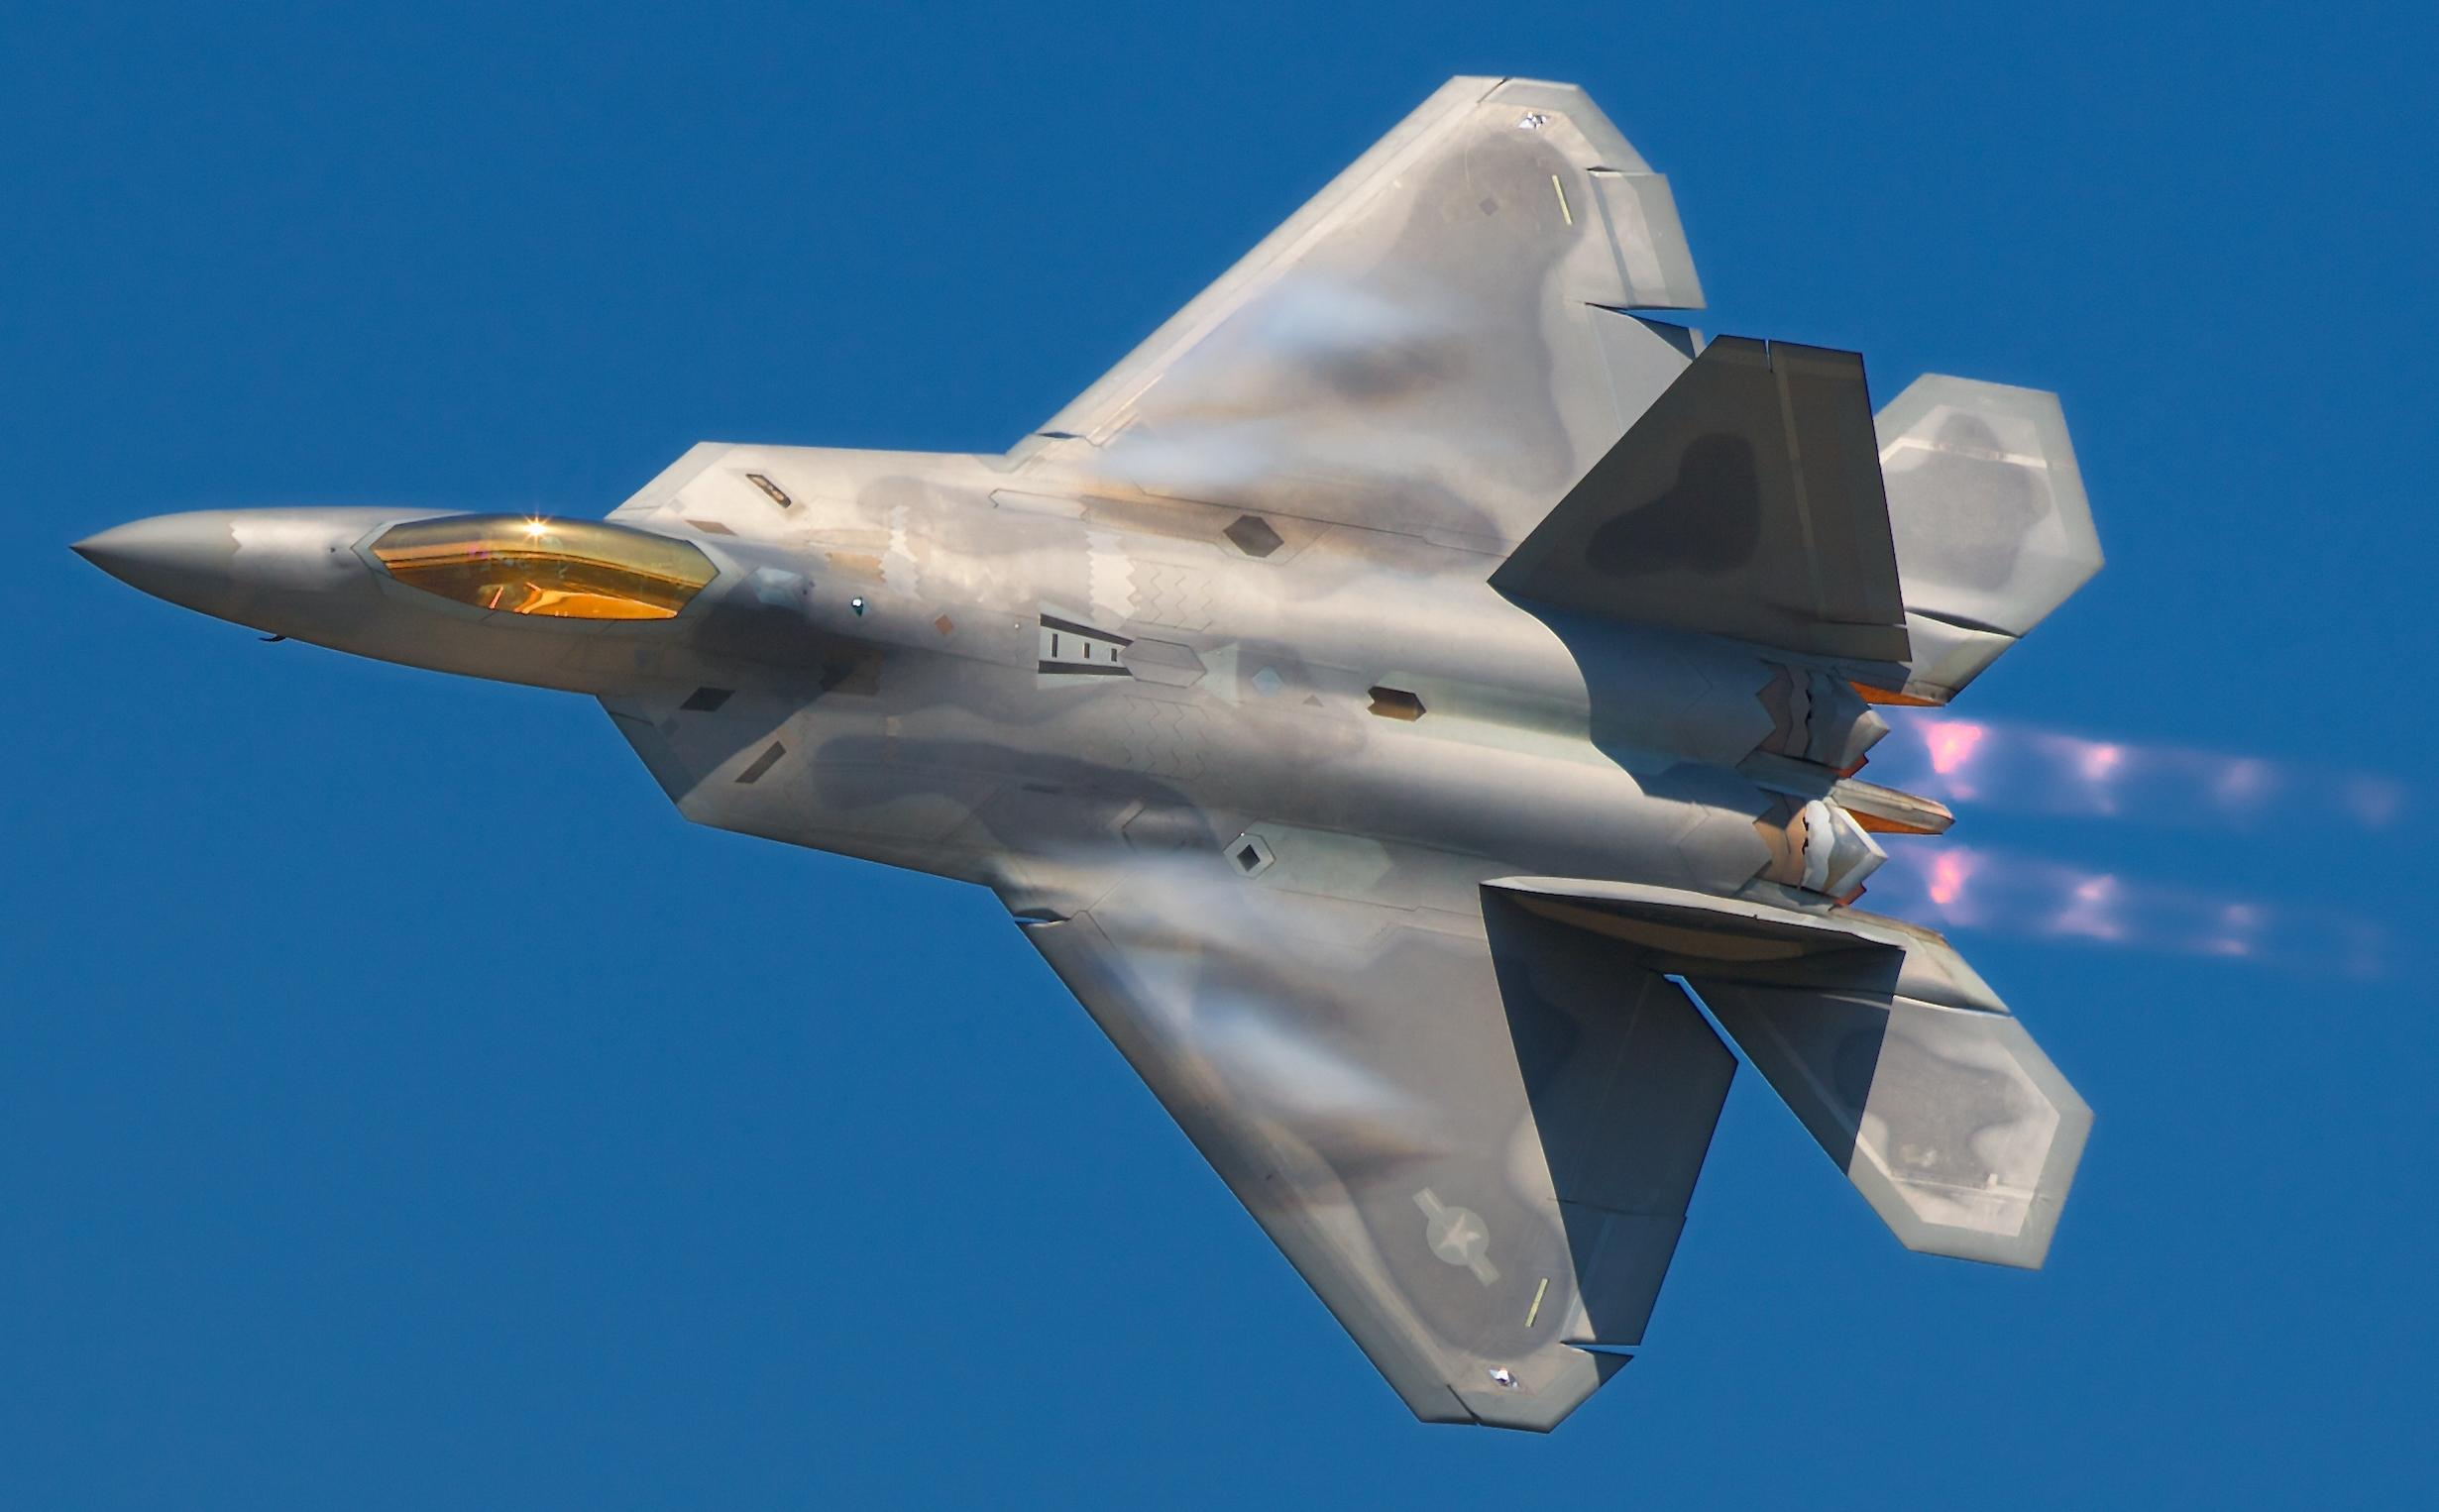 http://nycaviation.com/newspage/wp-content/uploads/2009/09/Lockheed_Martin_F-22A_Raptor_JSOH.jpg